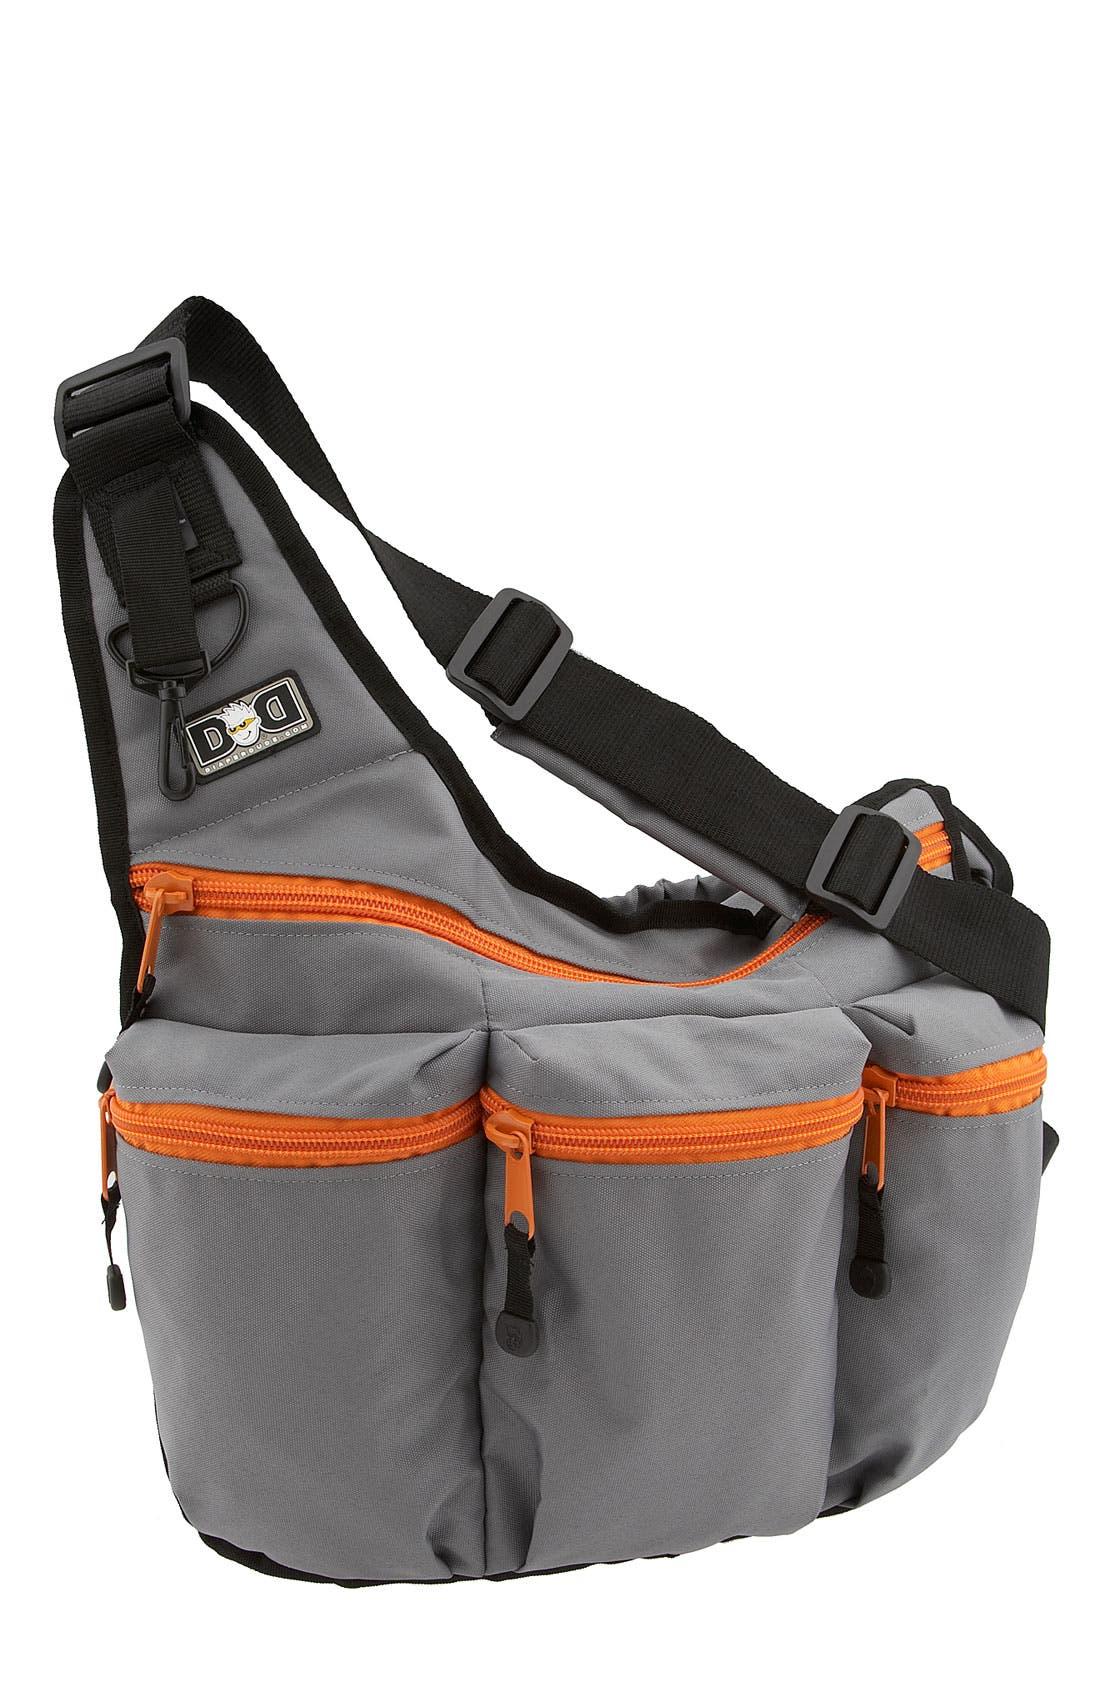 Alternate Image 1 Selected - Diaper Dude Shoulder Messenger Bag